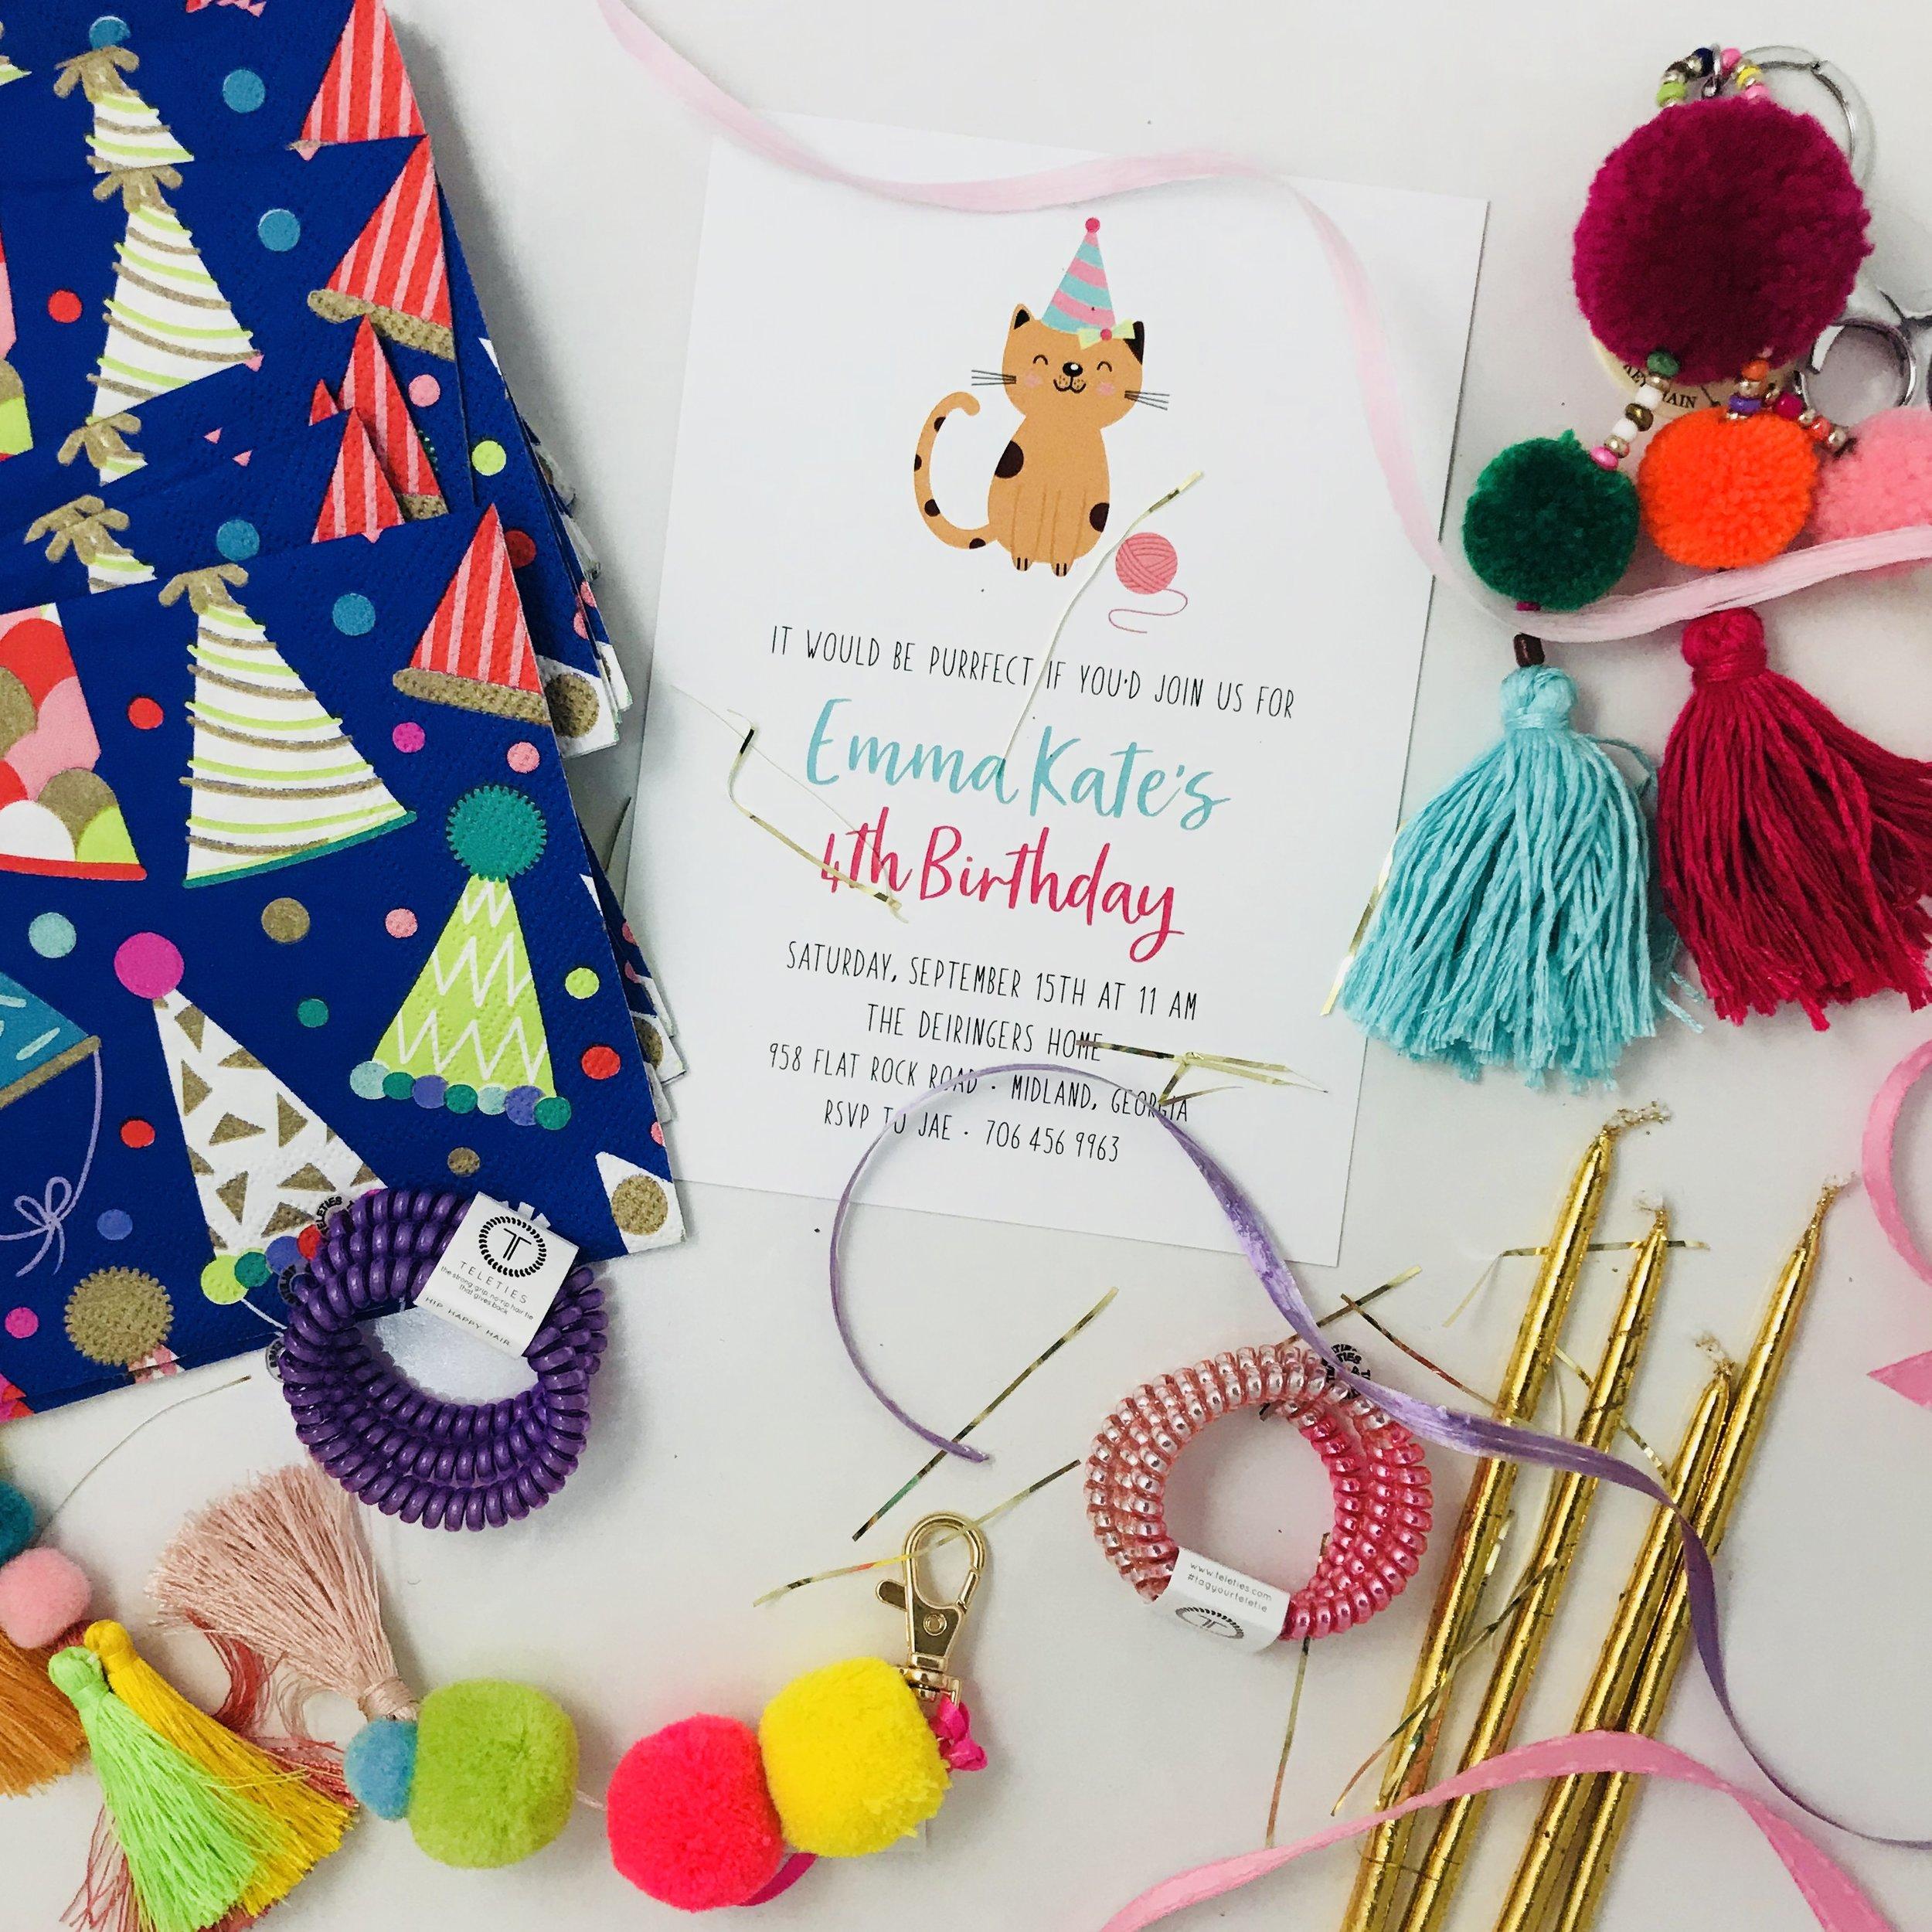 kids_birthday_invitation.jpg